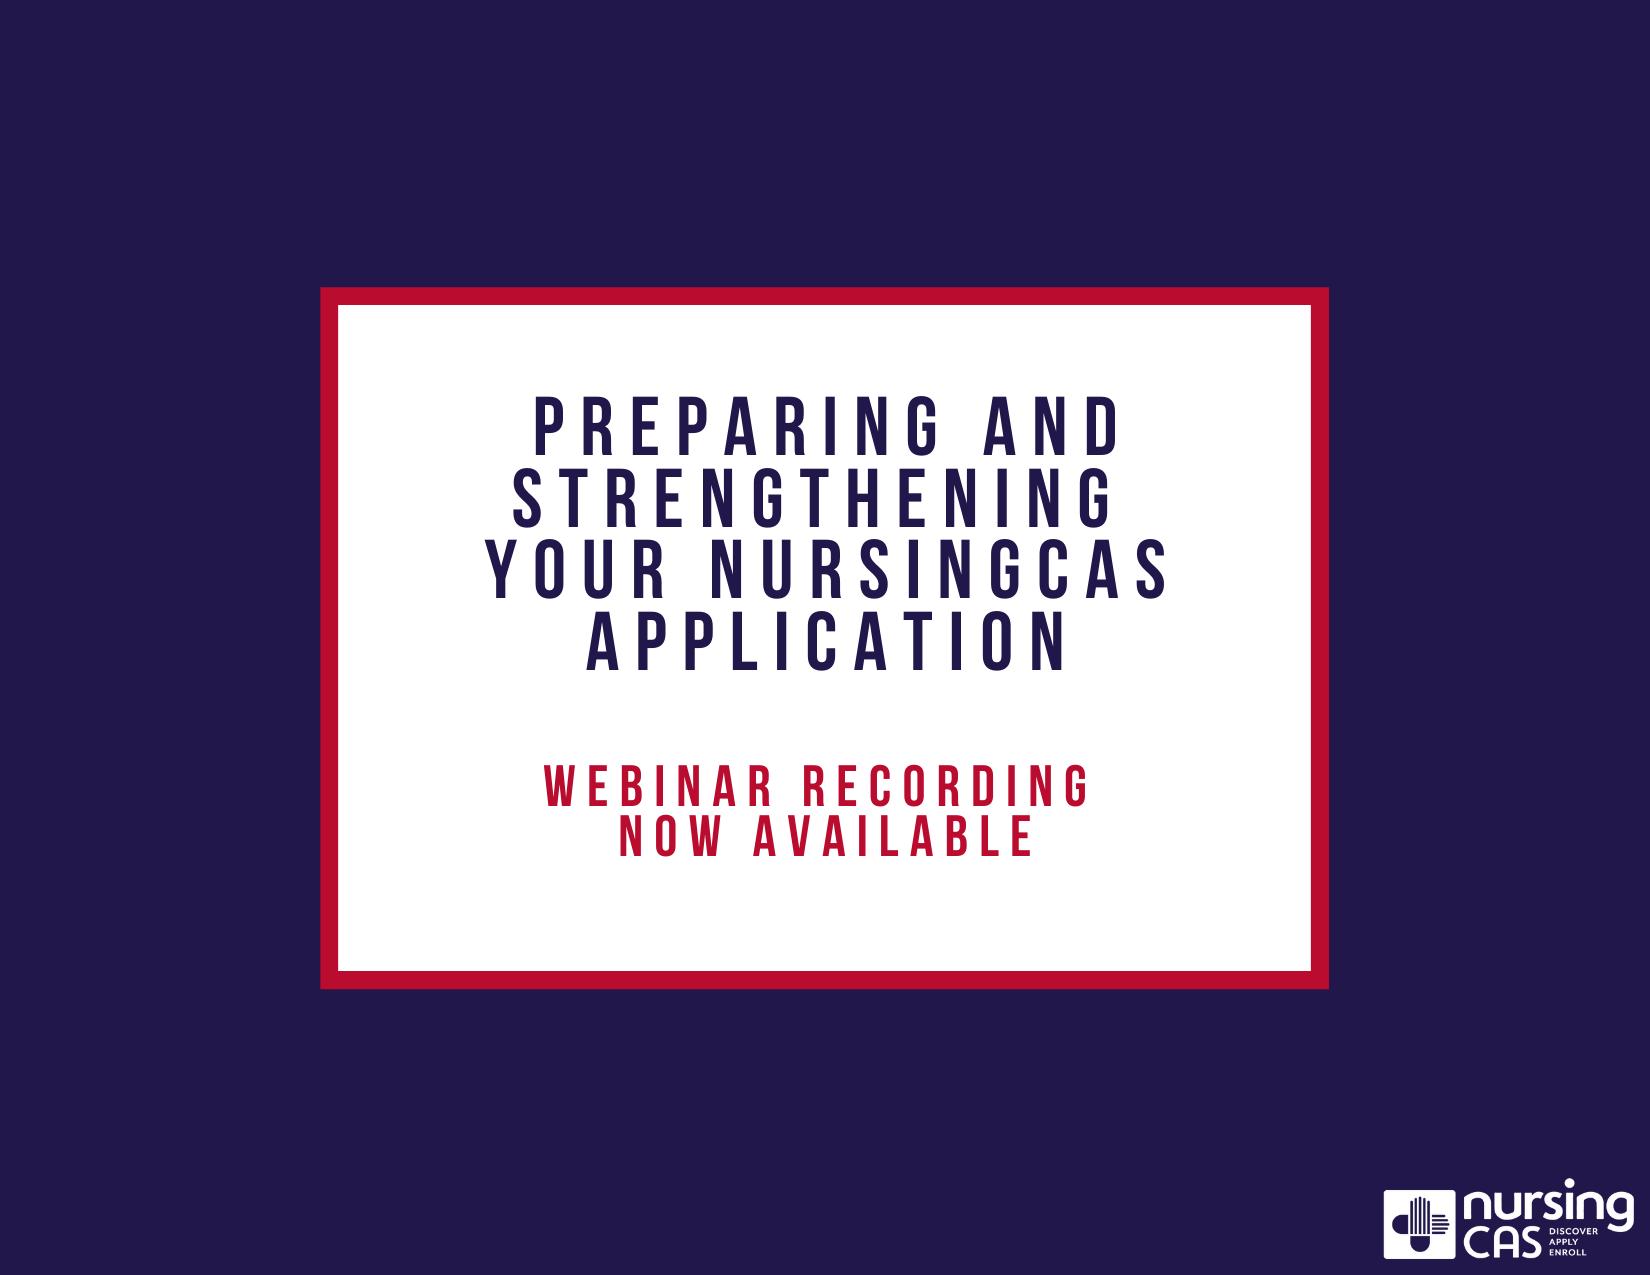 Preparing and Strengthening Your NursingCAS Application Webinar Recording Image